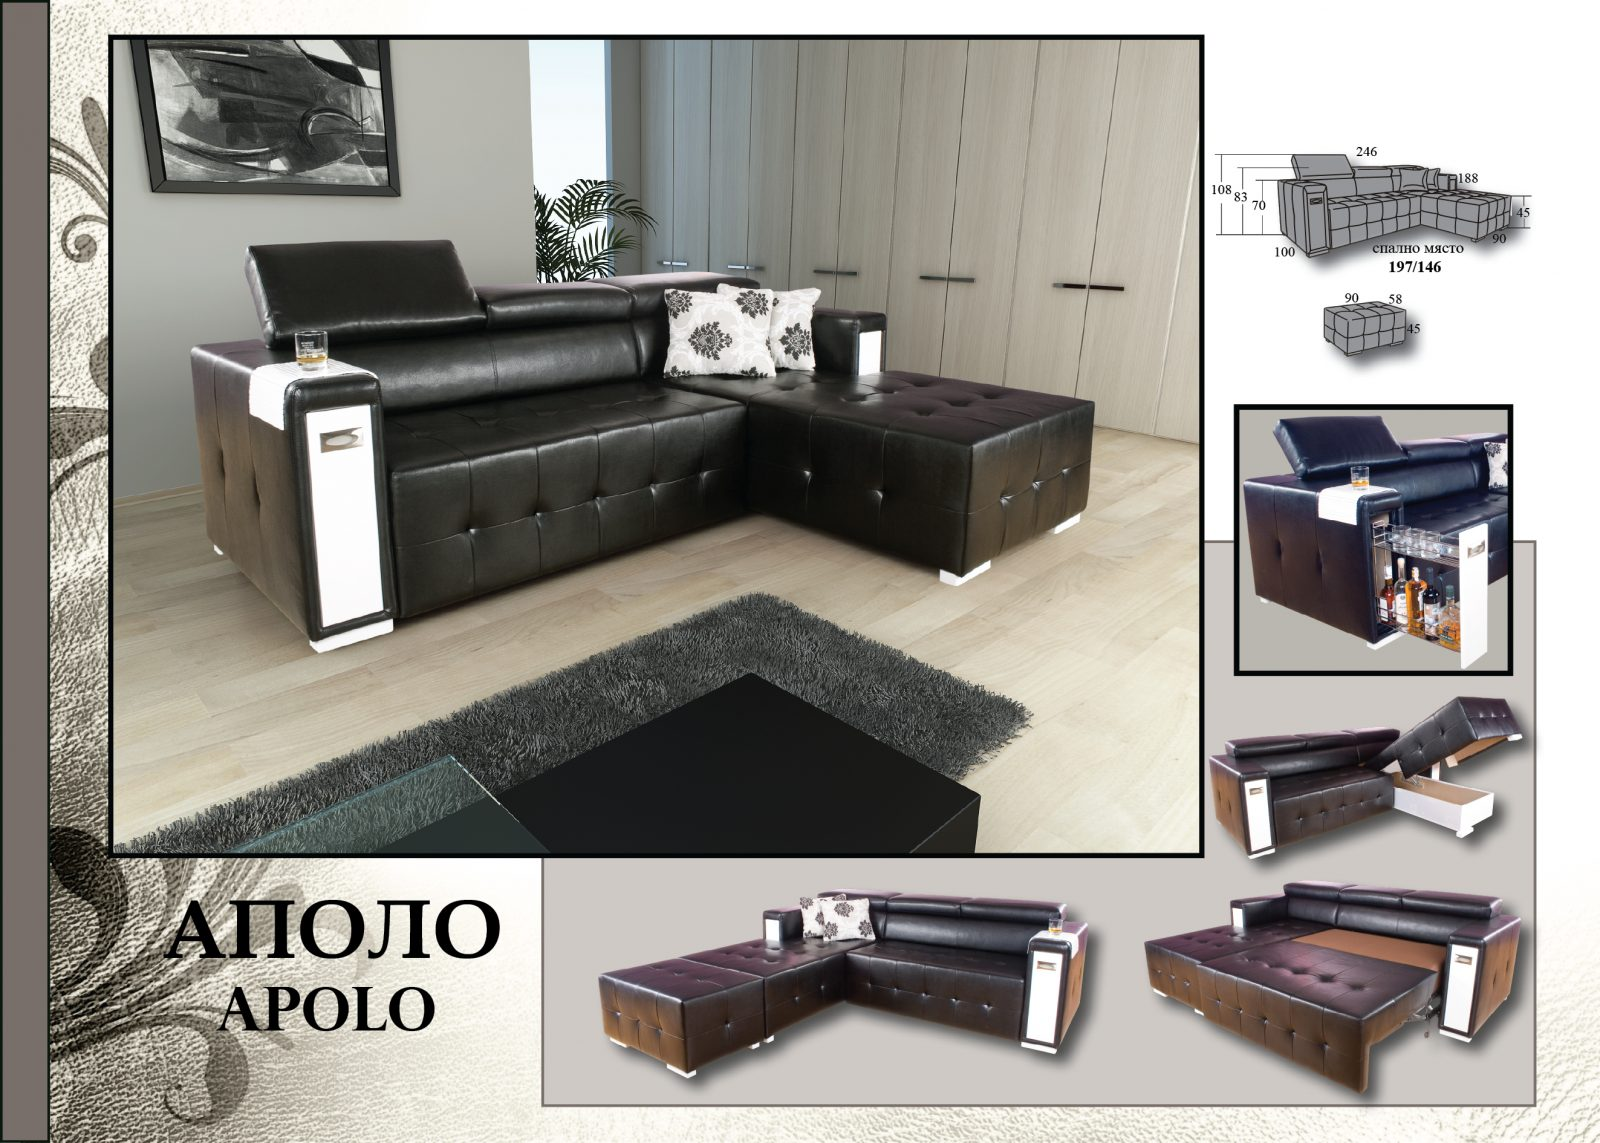 Луксозни дивани Руди ан  Ъгъл Аполо